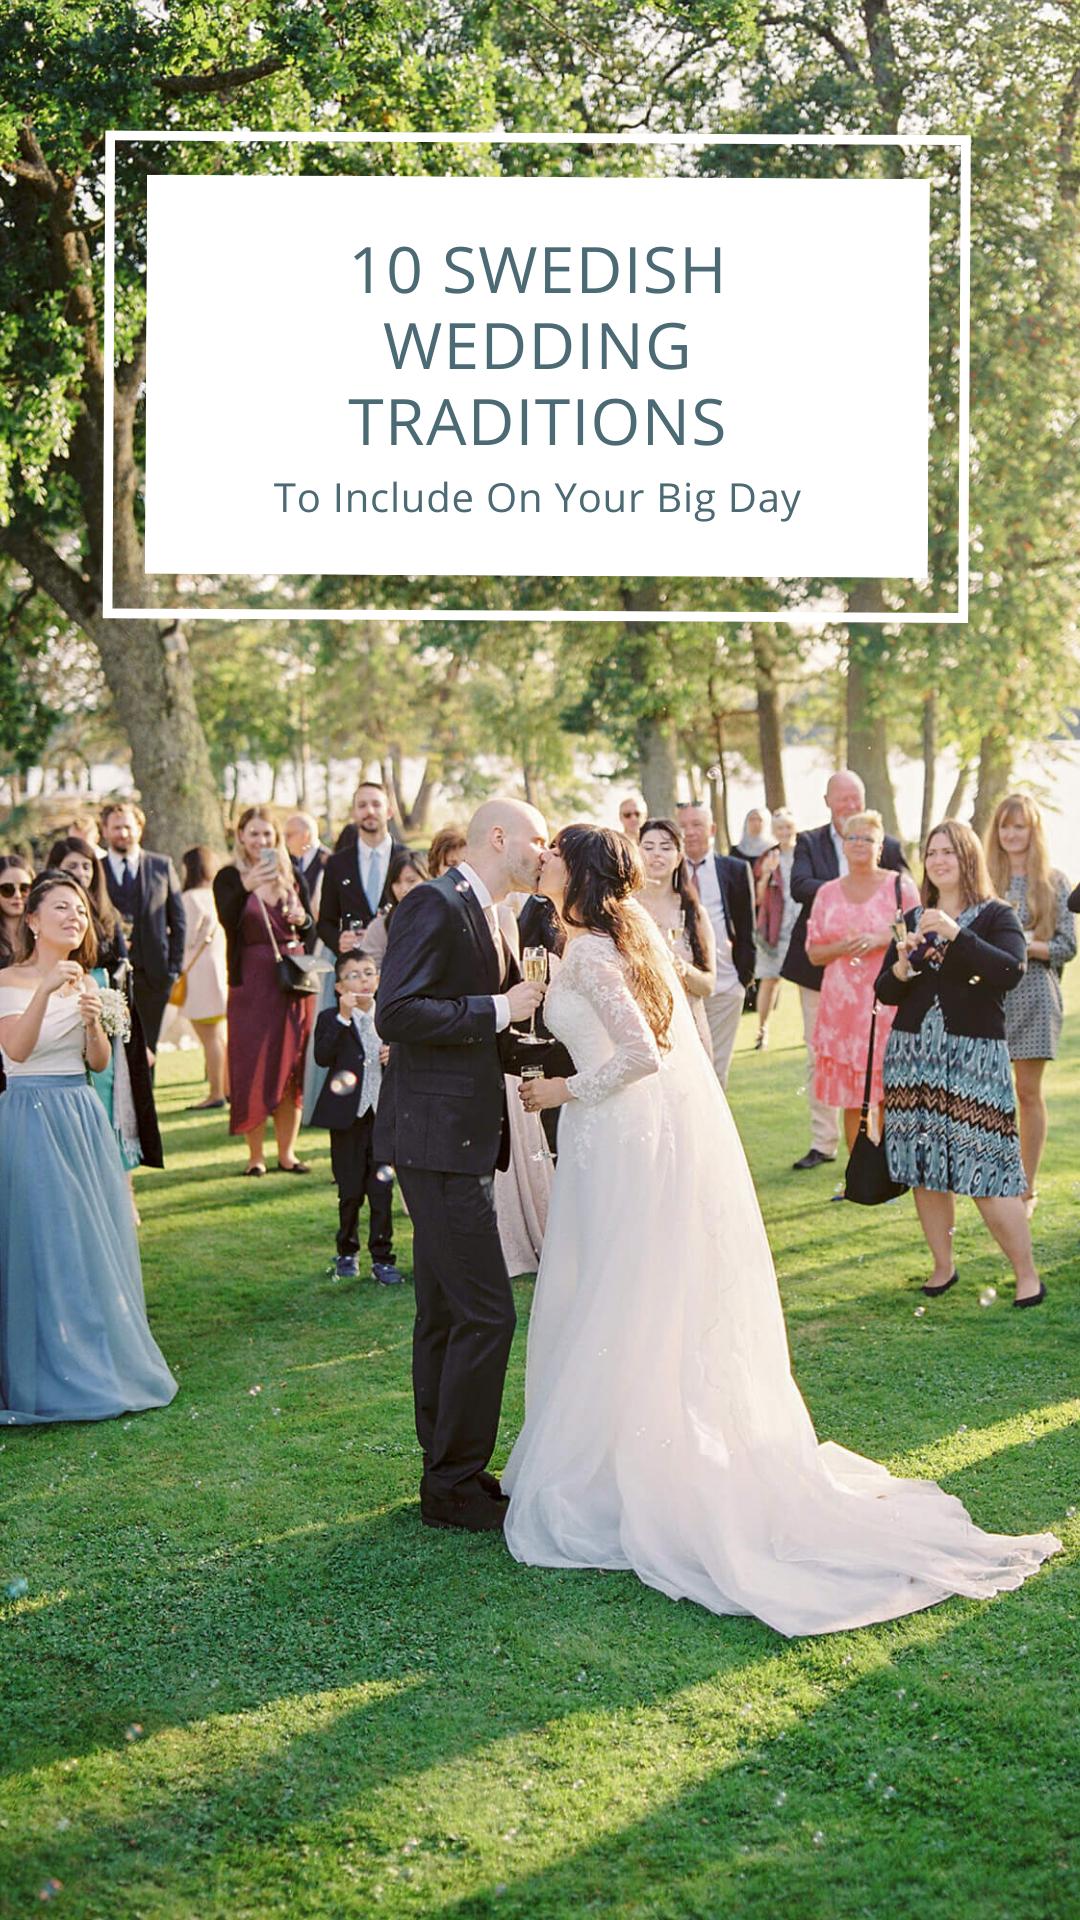 Swedish Wedding Traditions For Your Big Day 2 Brides Photography In 2020 Swedish Wedding Bride Photography Wedding